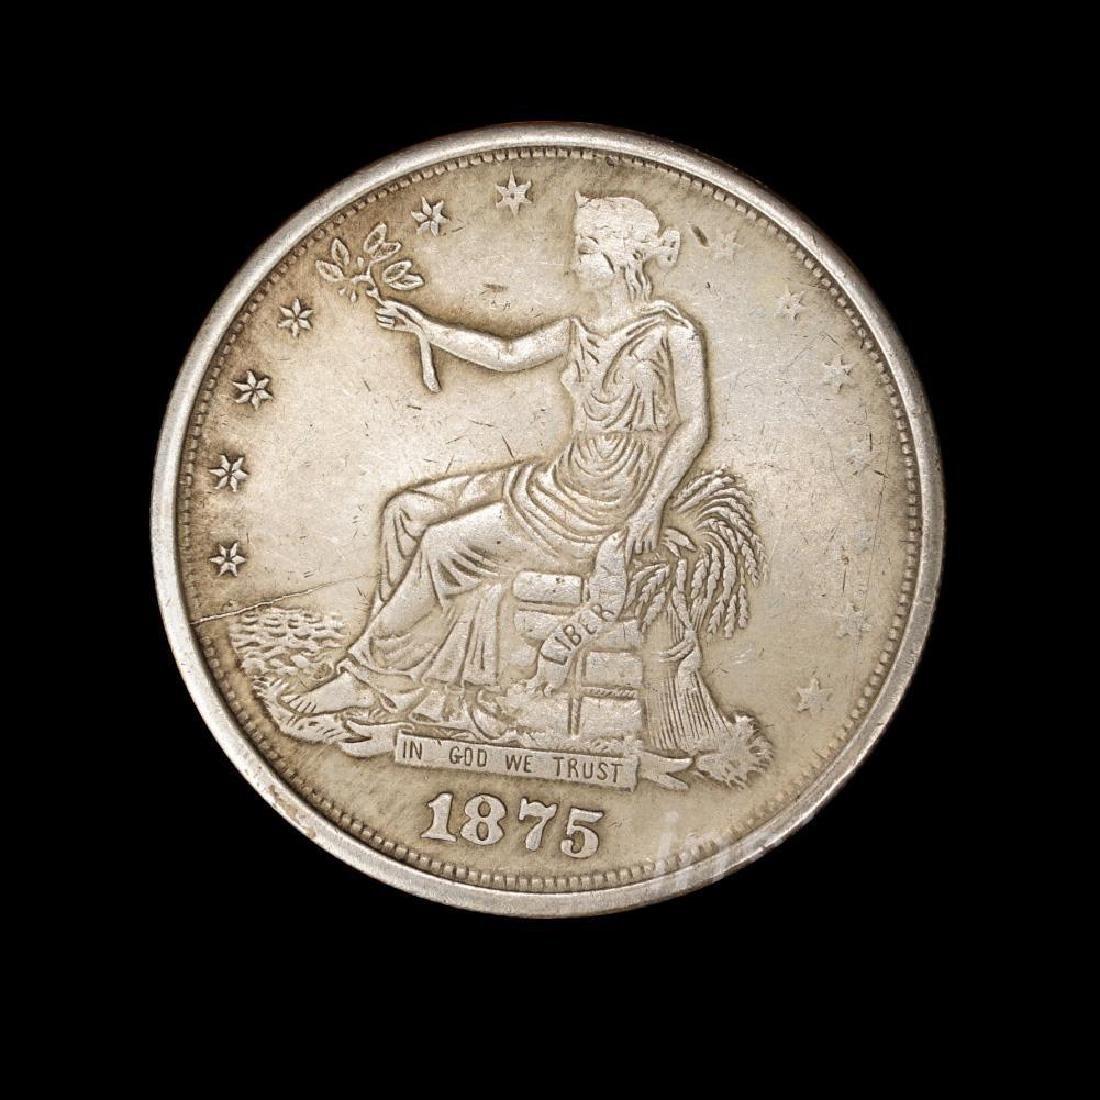 1875 United States Trade Dollar Commemorative Coin - 4